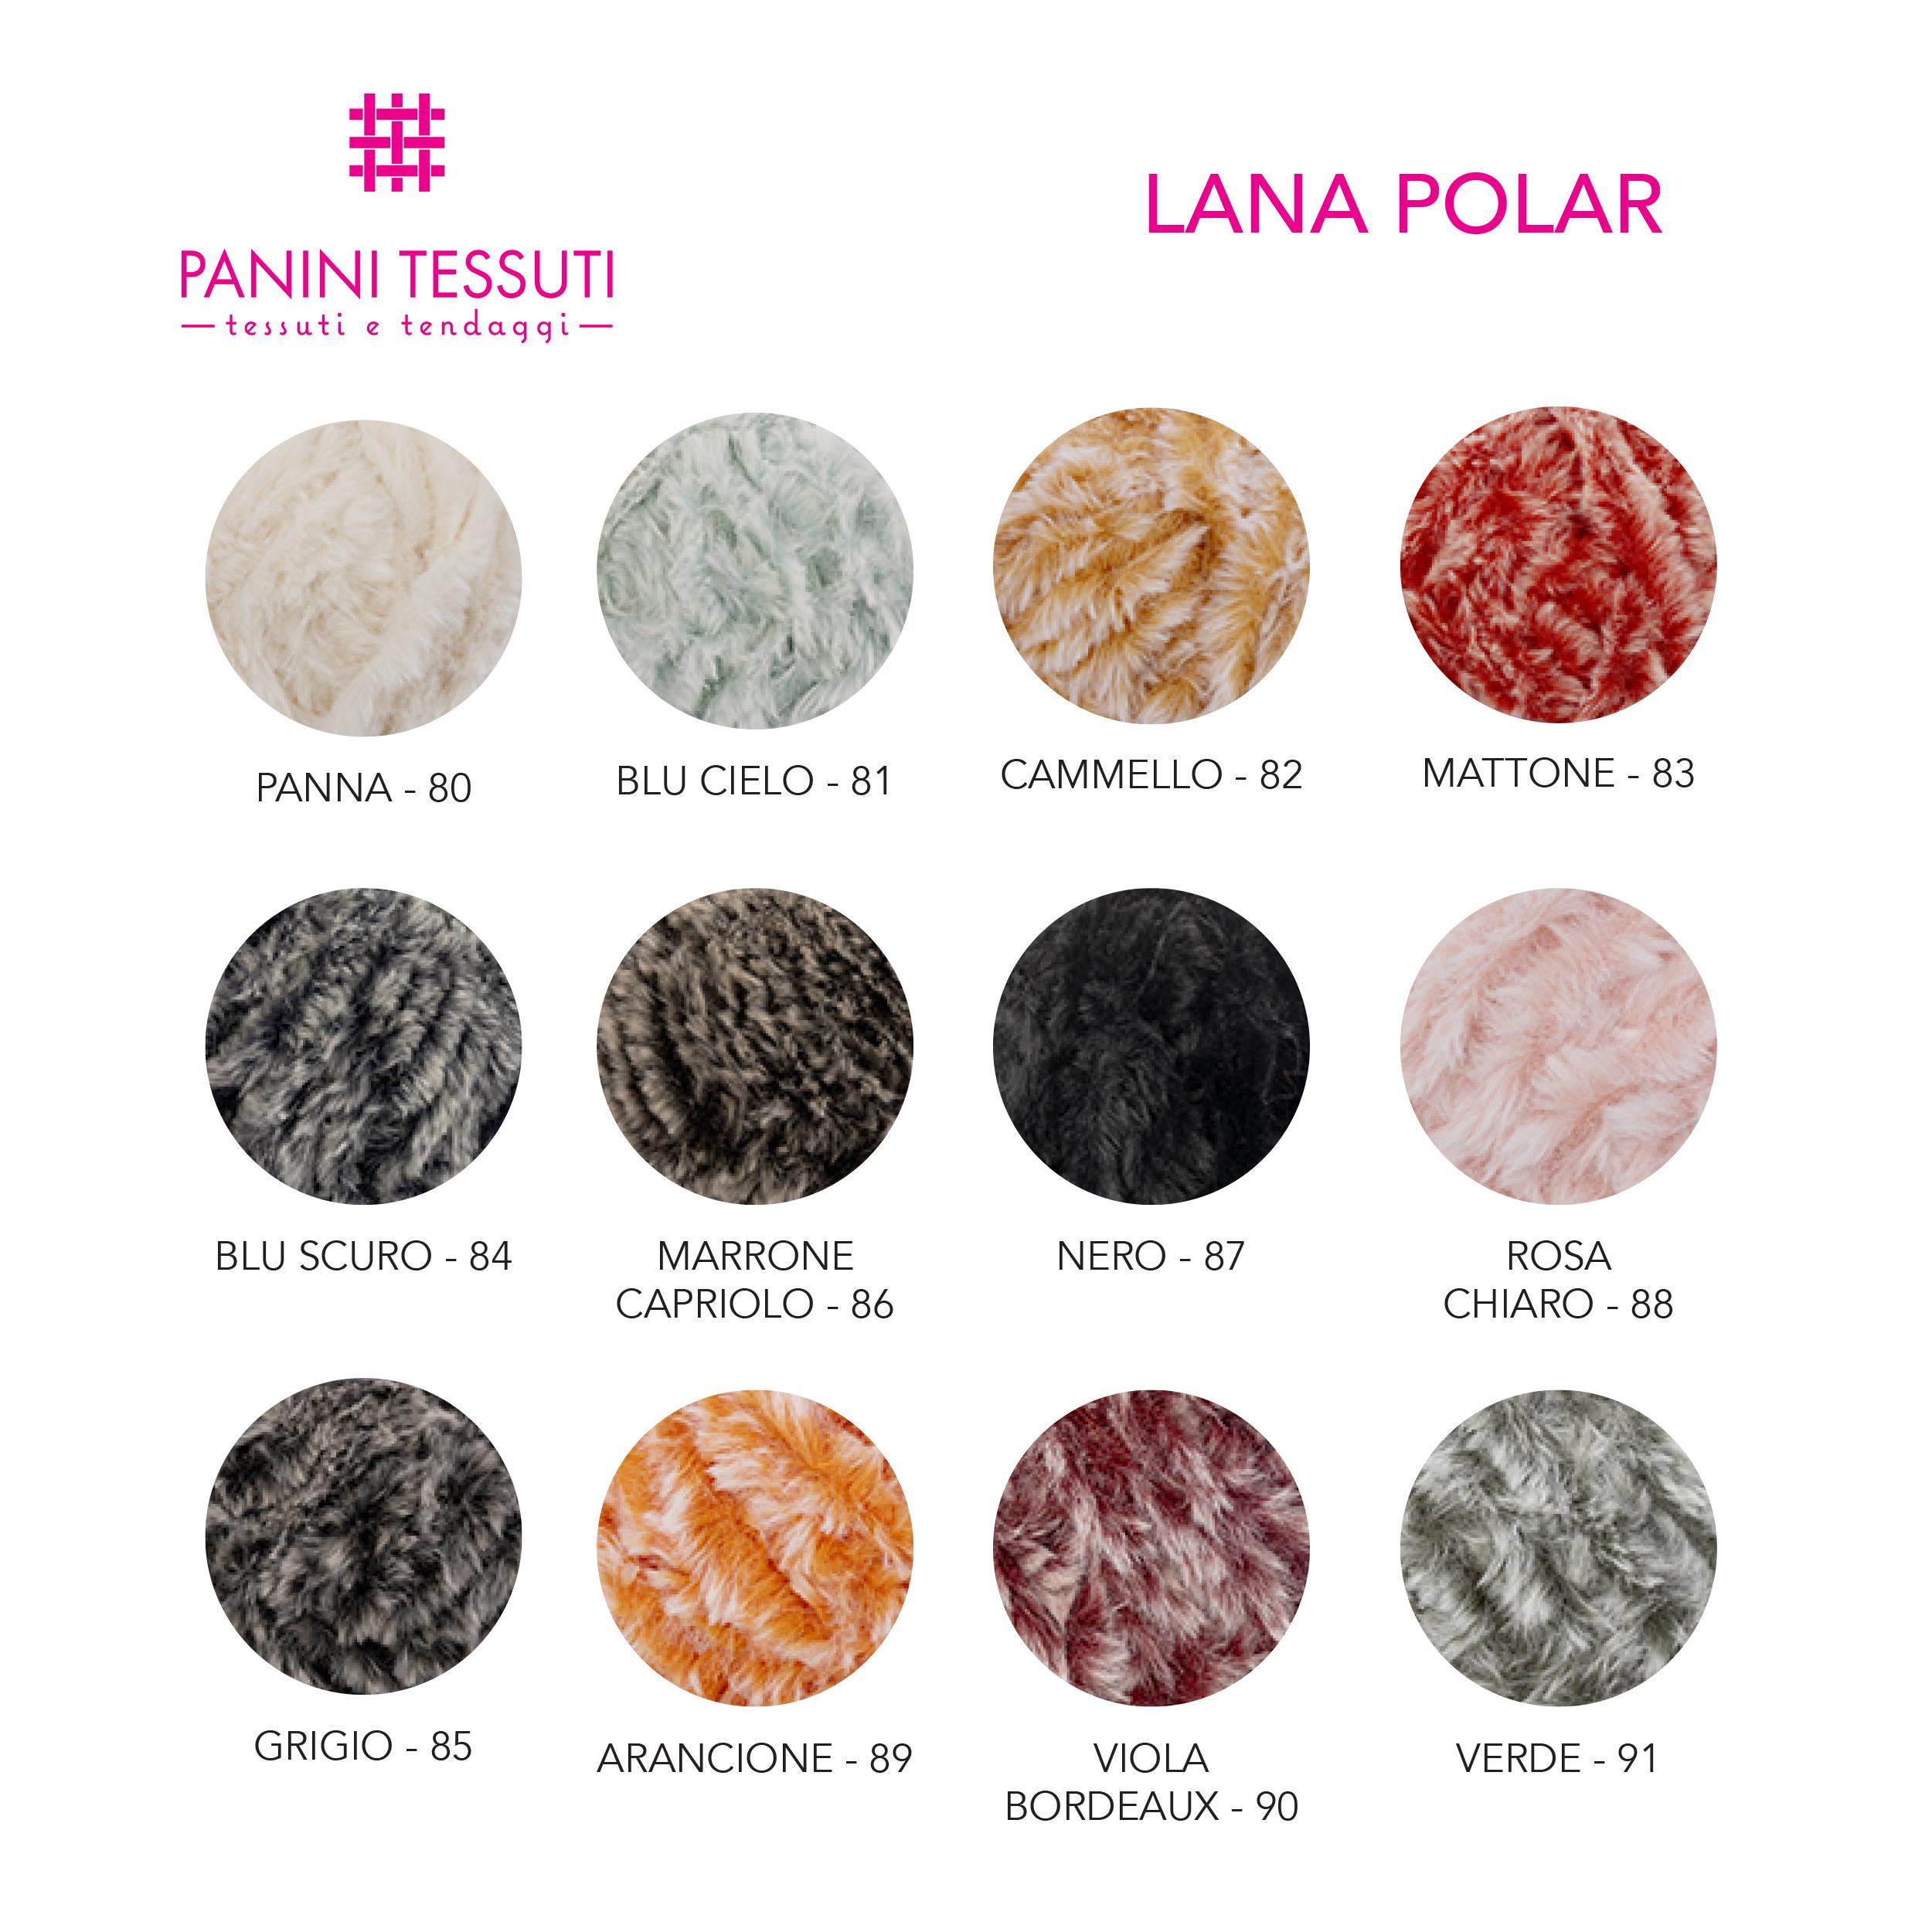 Lana Polar